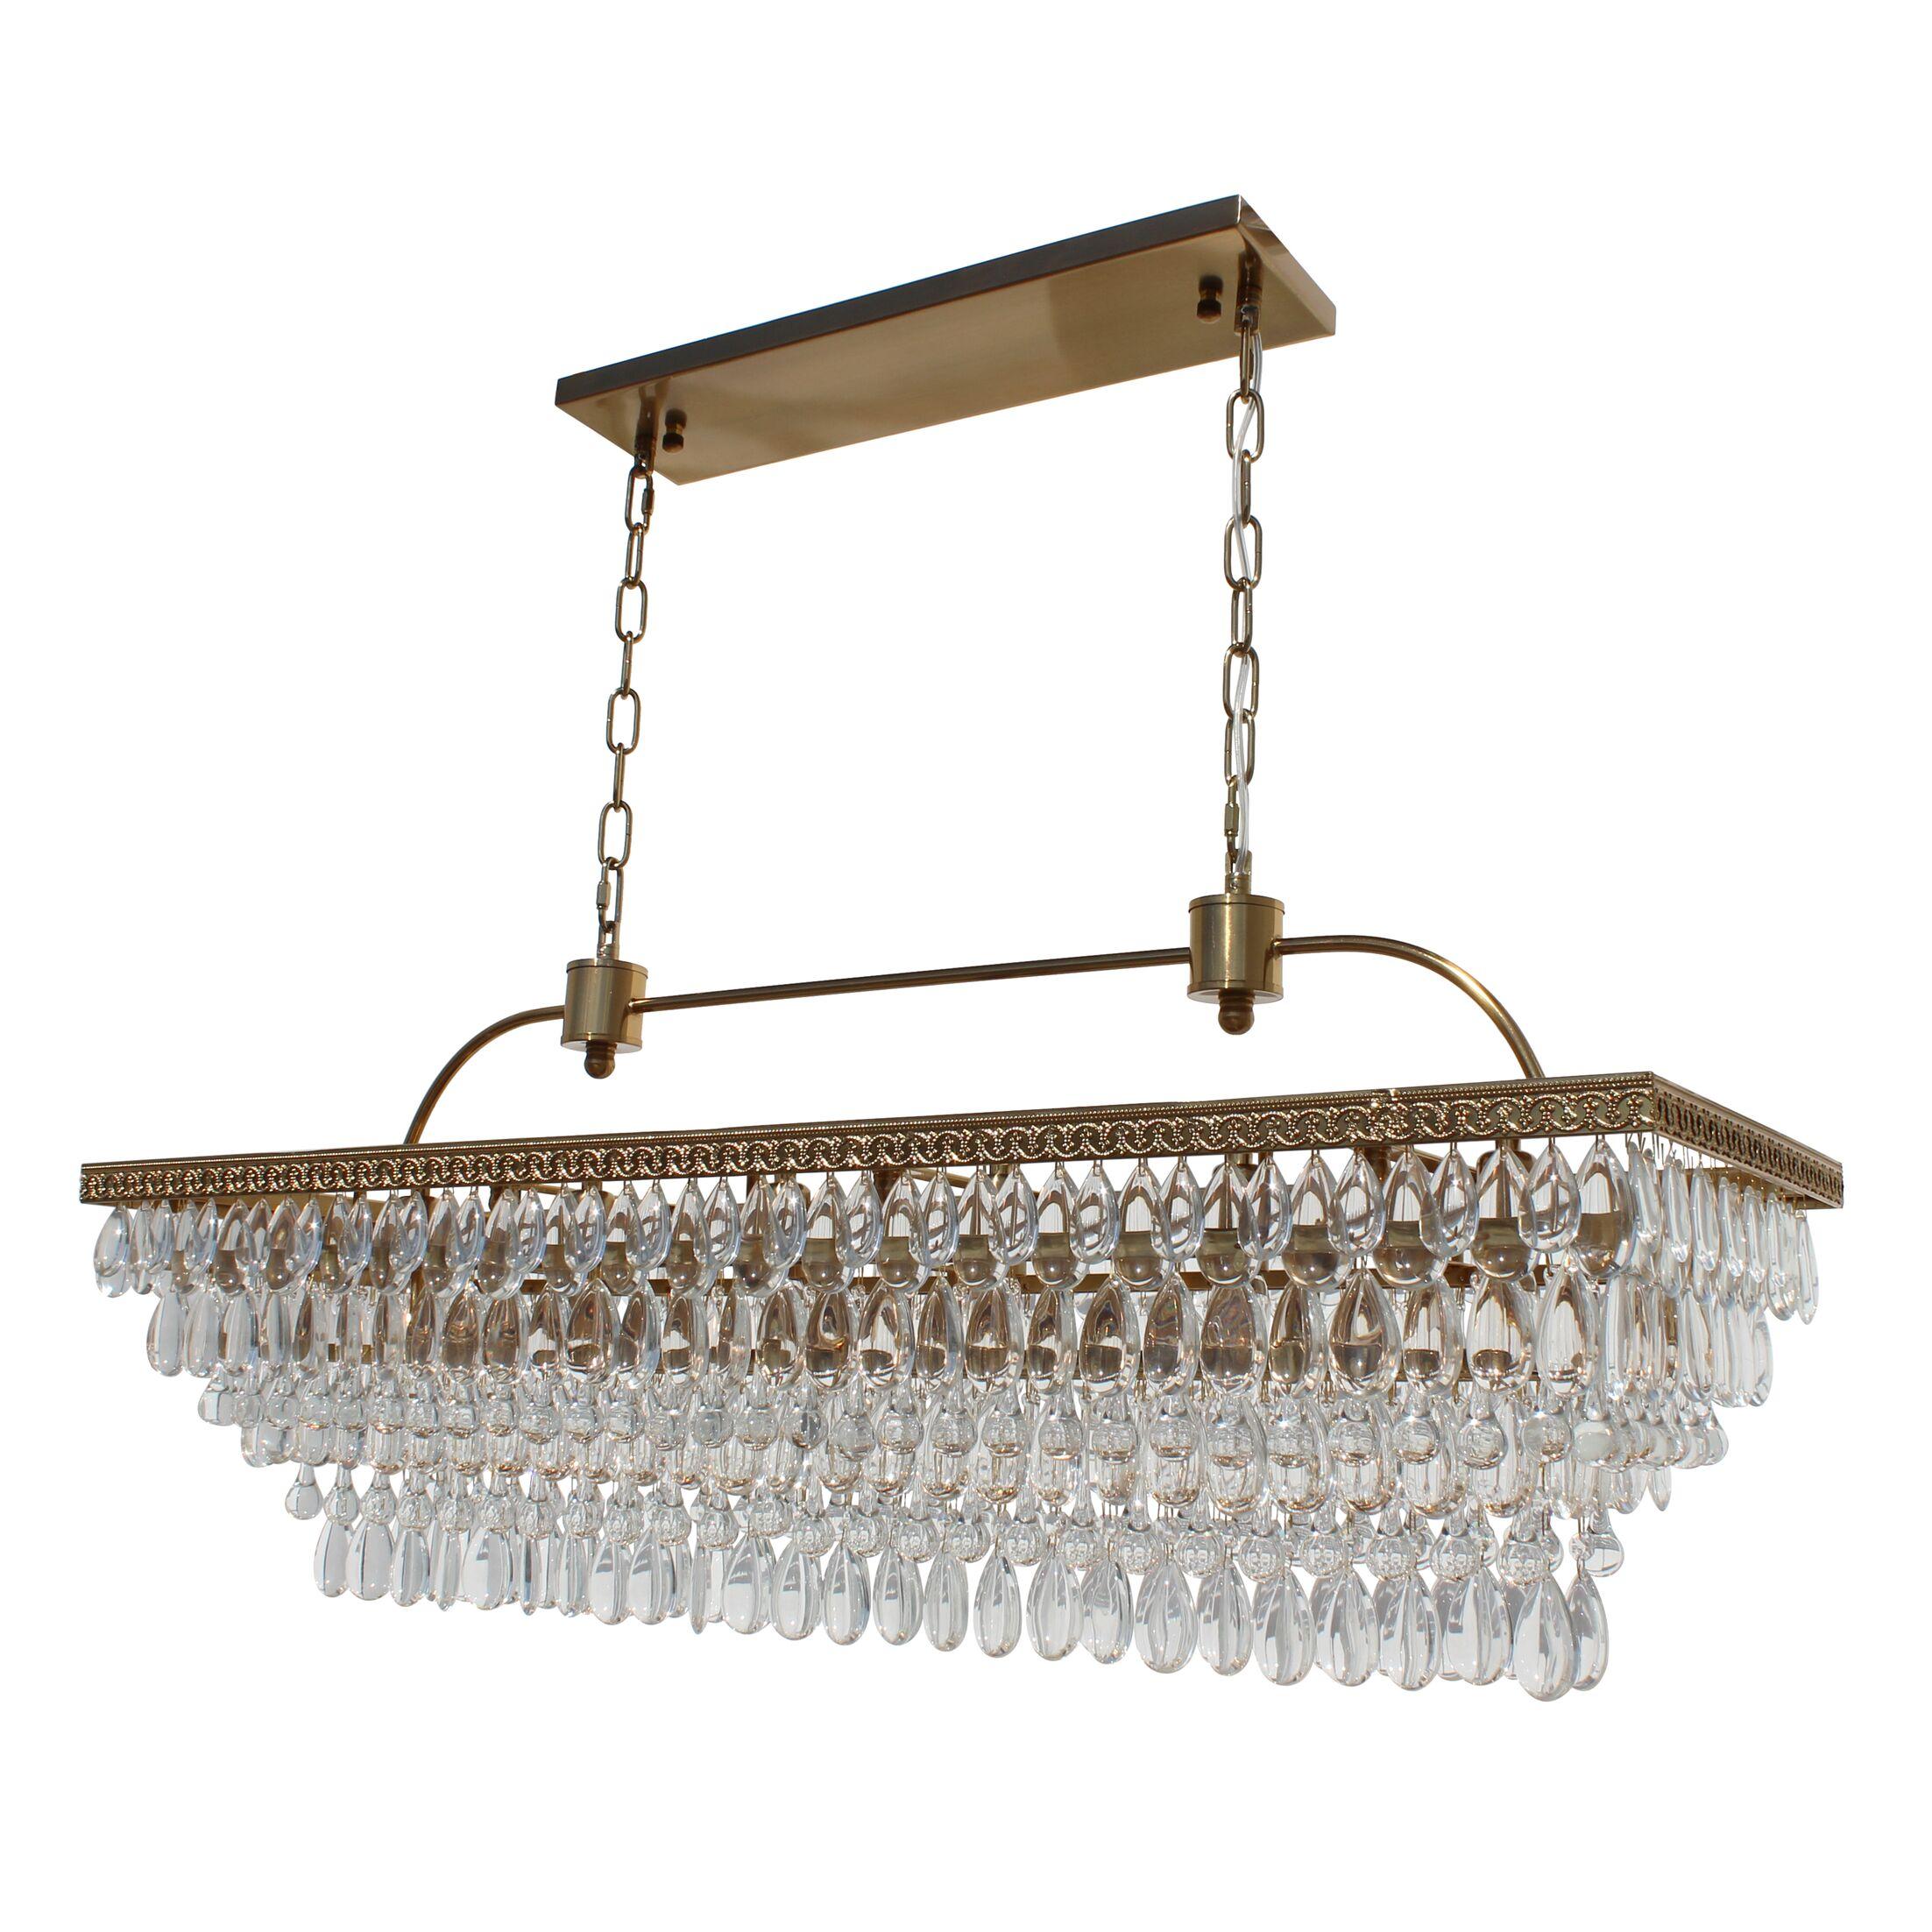 Dix 6-Light Crystal Chandelier Finish: Brass